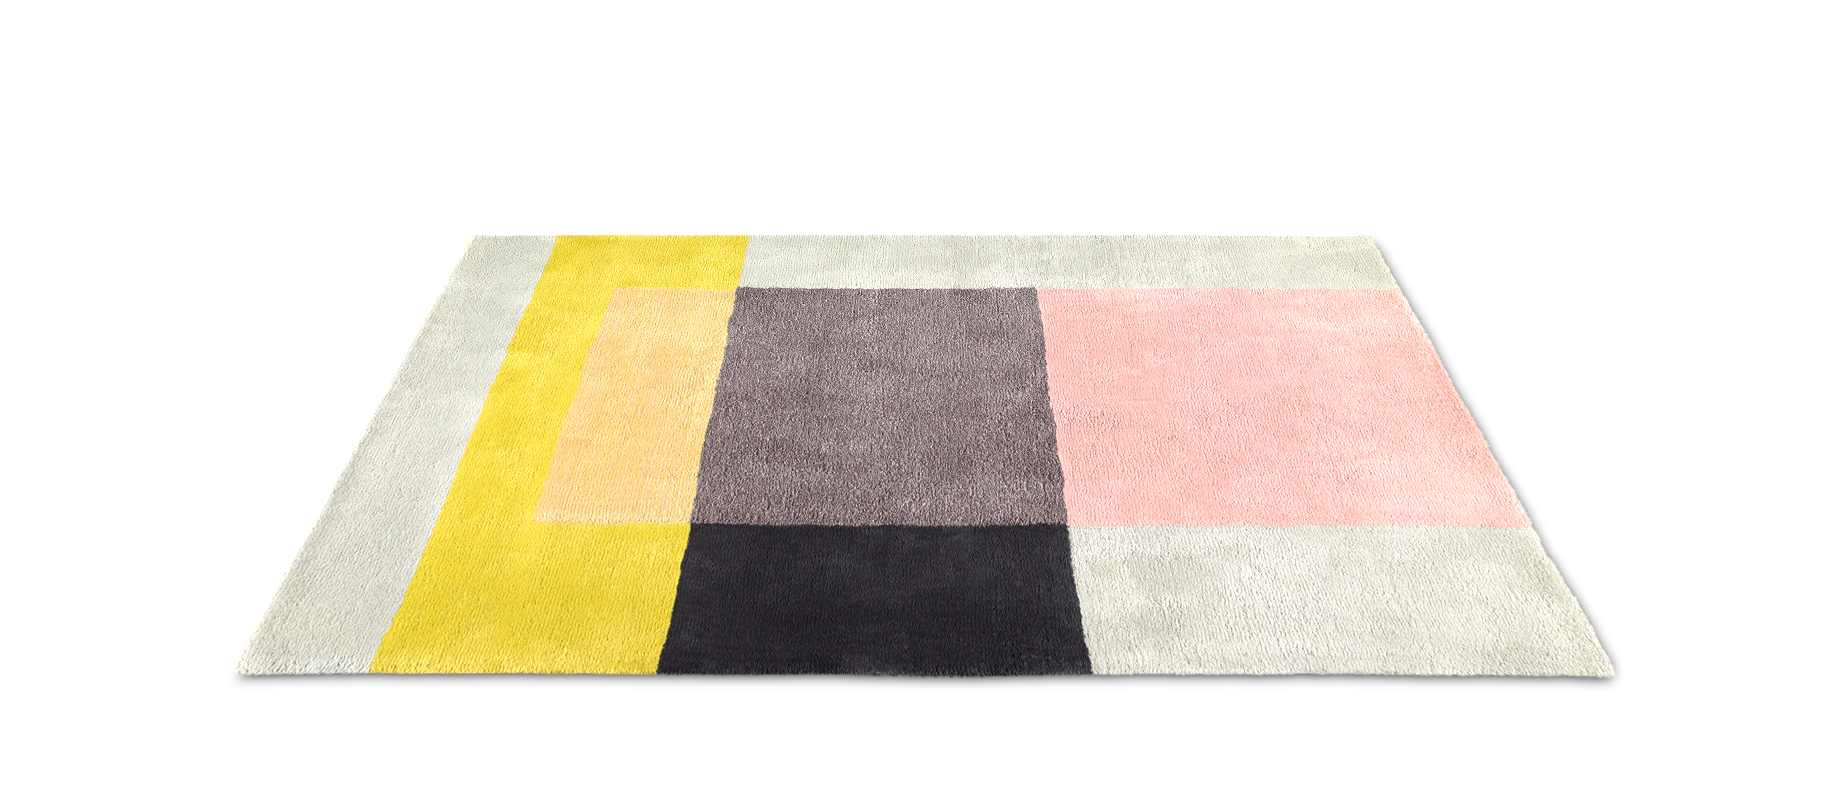 colour carpet 05 olsson gerthel. Black Bedroom Furniture Sets. Home Design Ideas